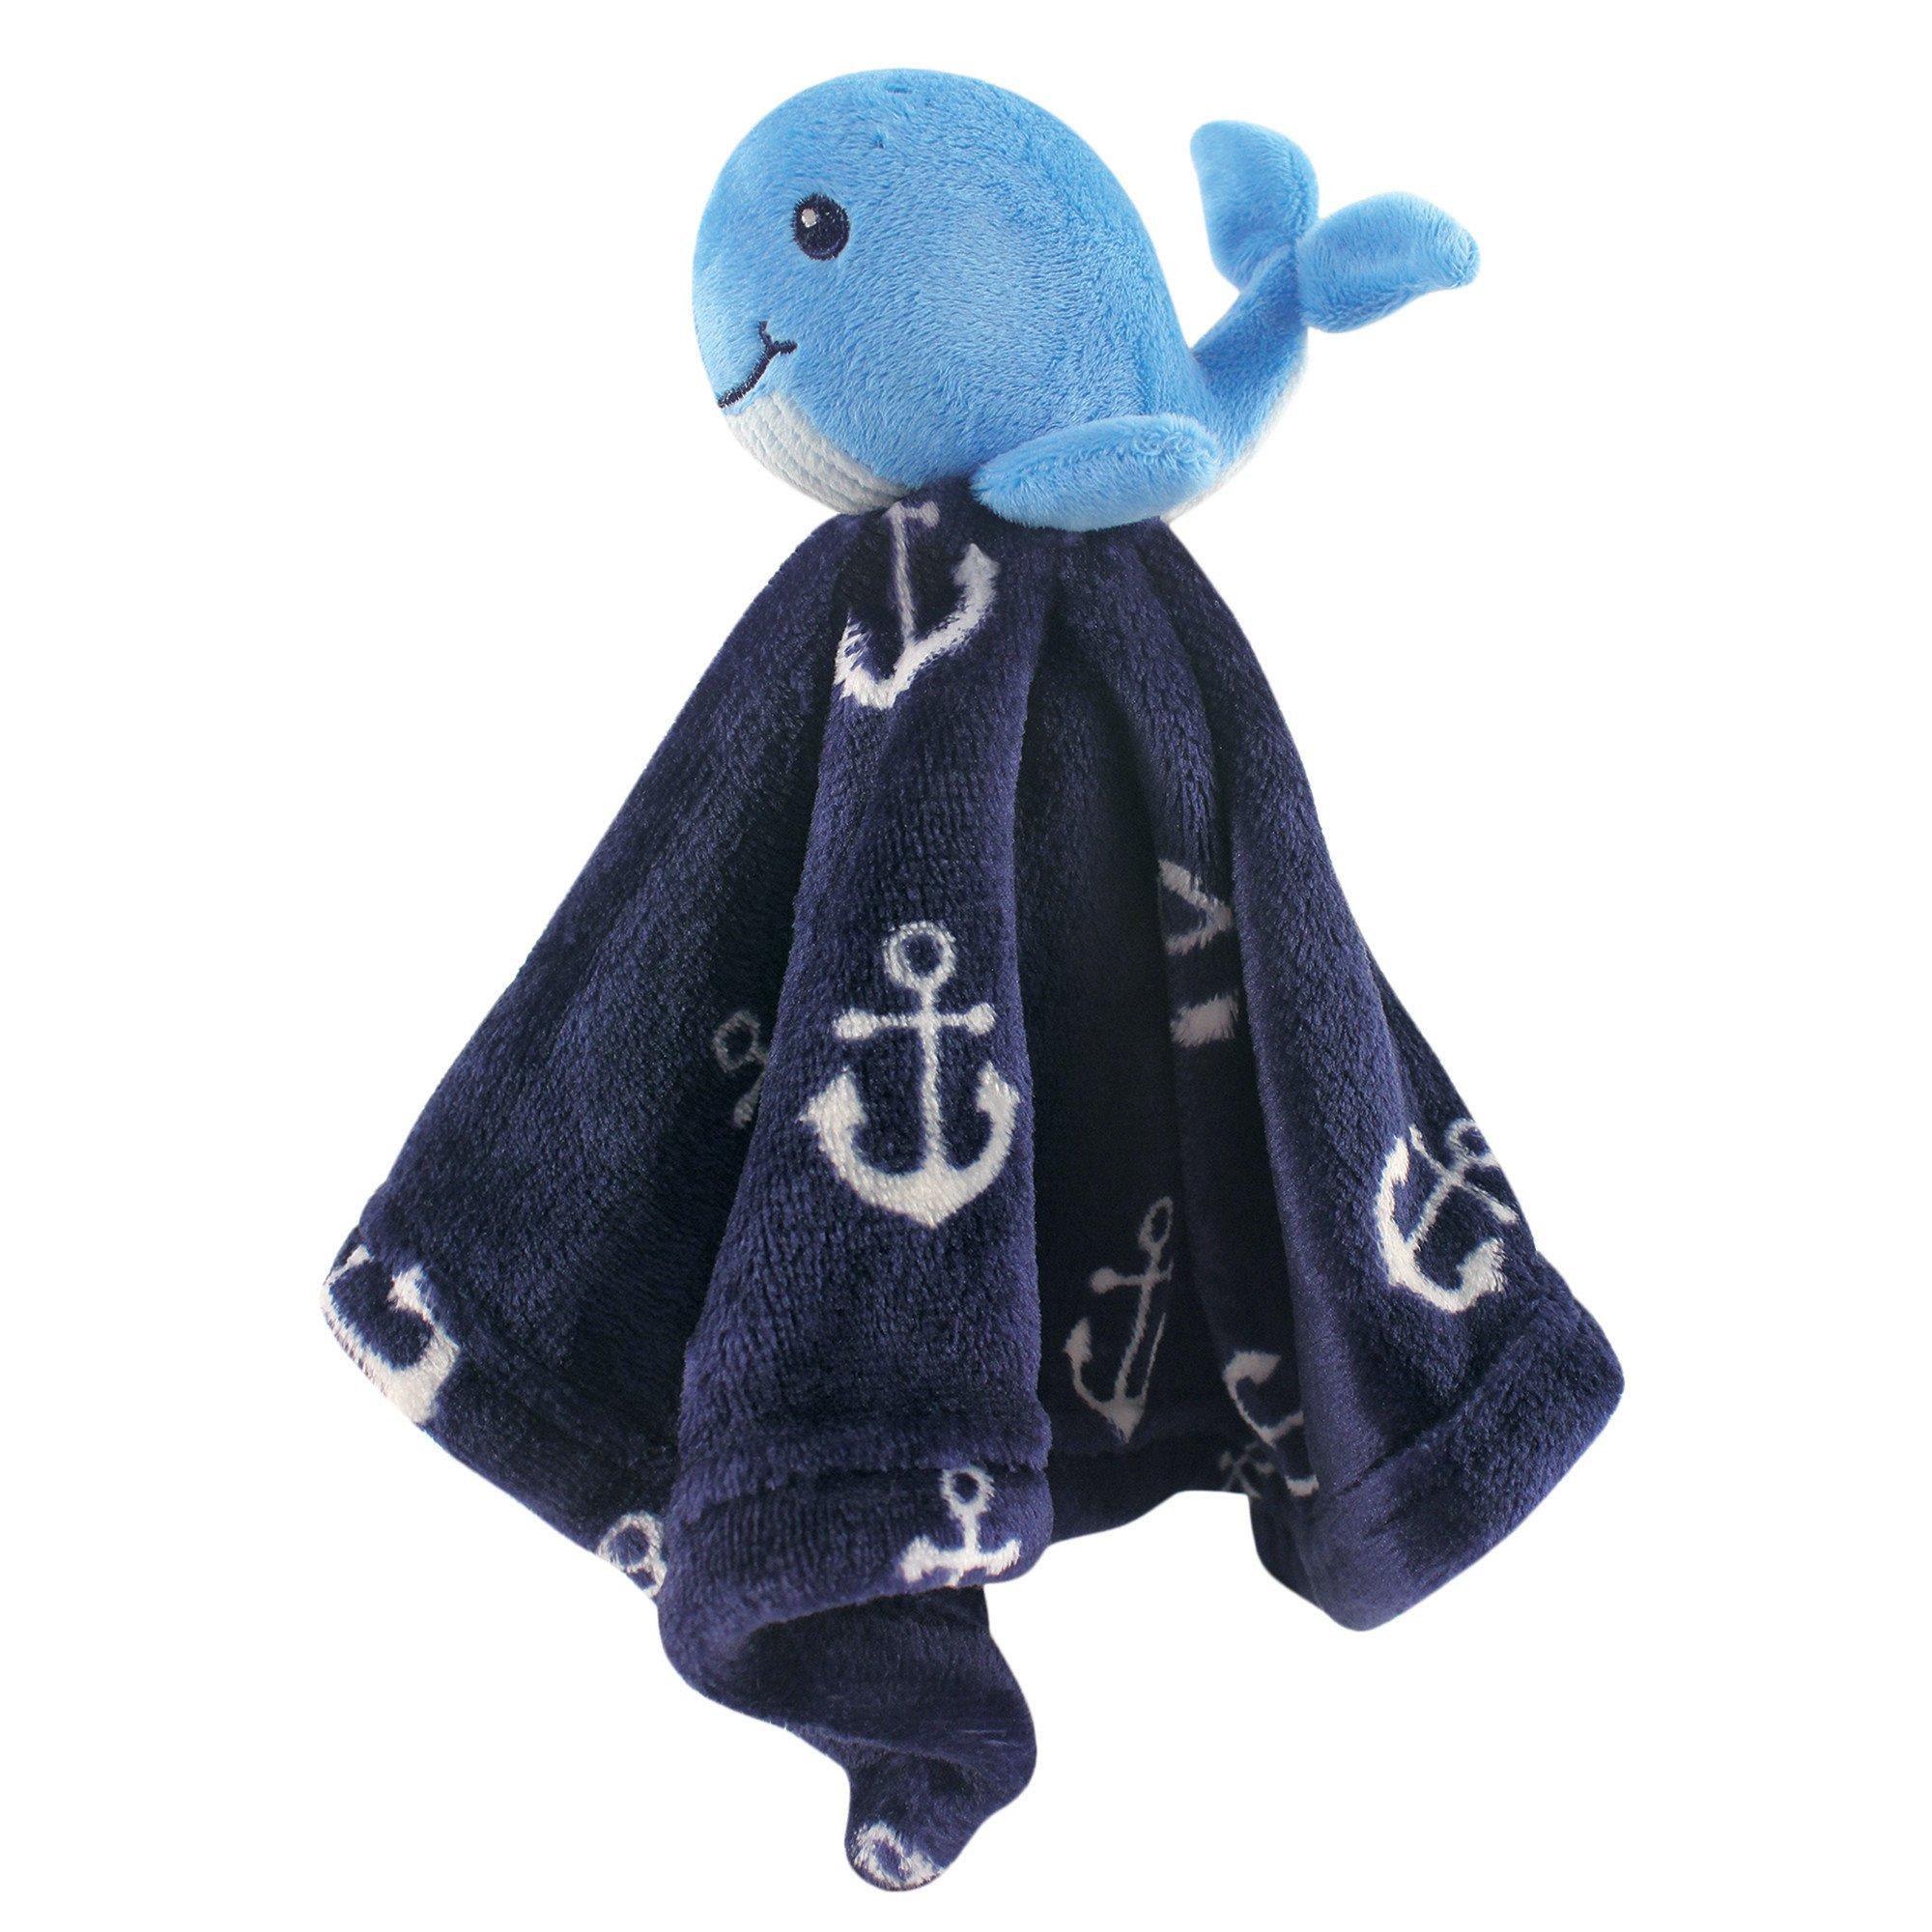 Hudson Baby Animal Friend Plushy Security Blanket, Boy Whale, One Size